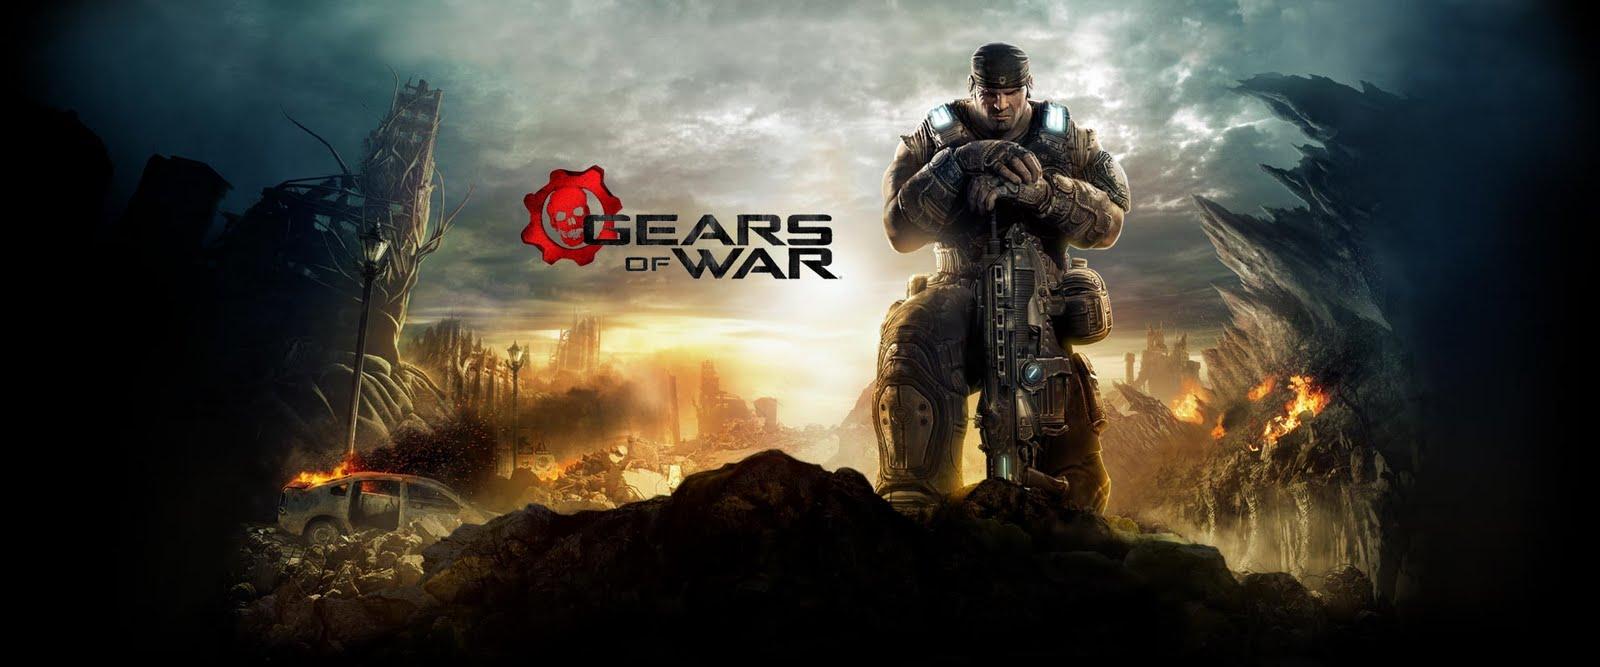 gallery for gears of war 3 wallpapers